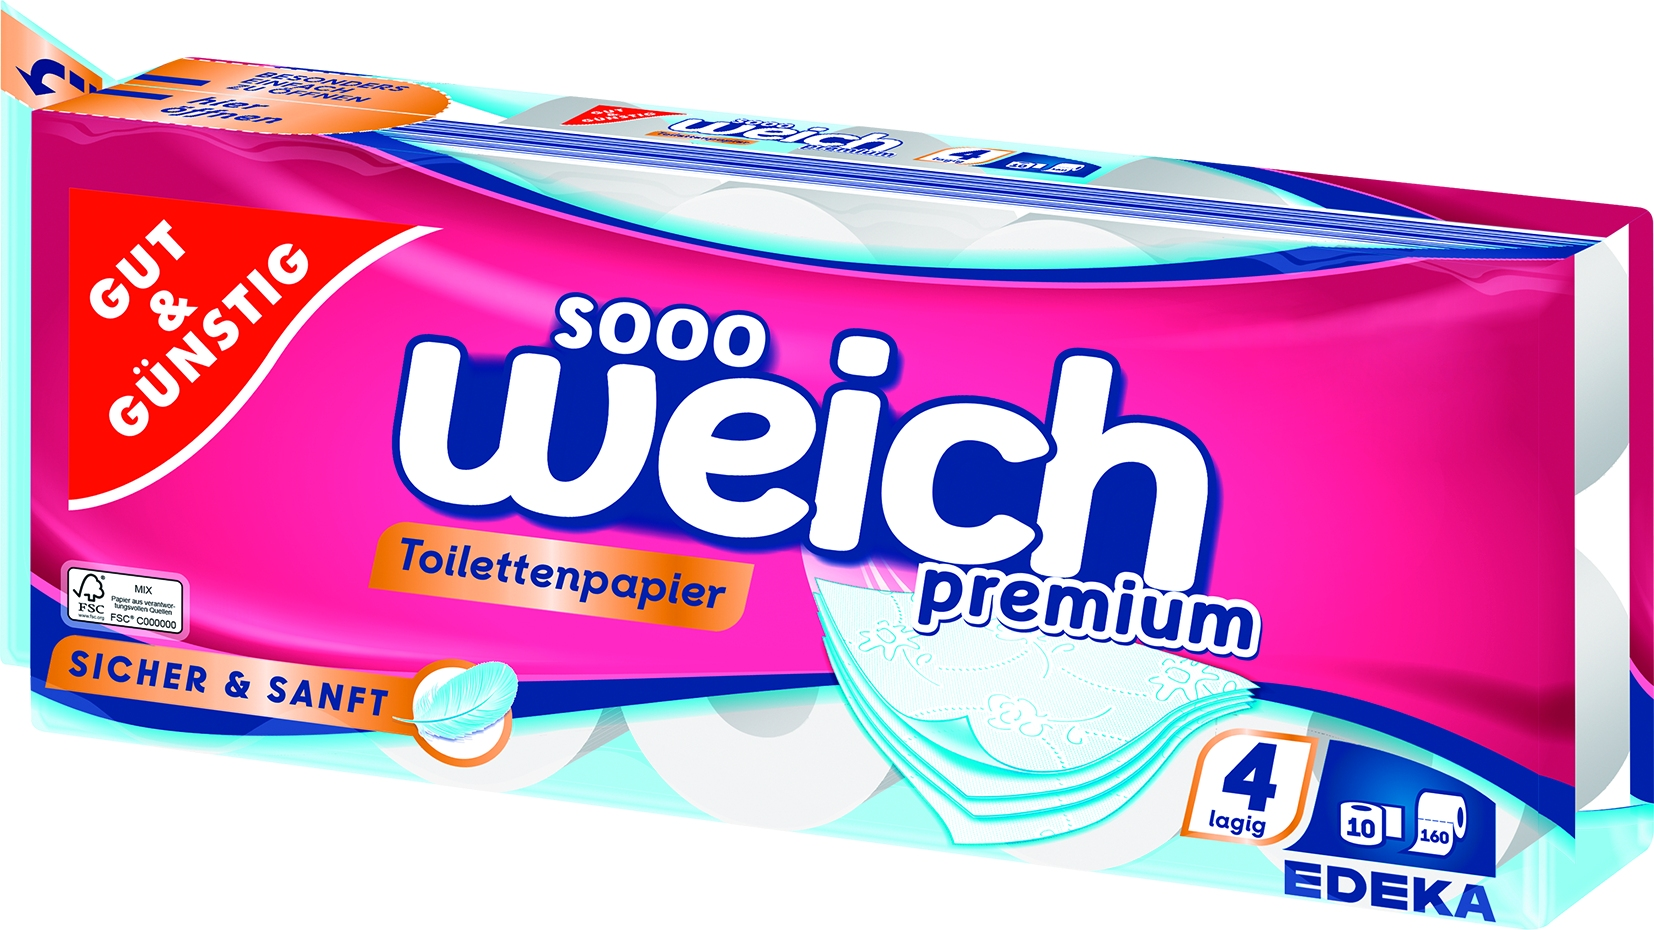 Toilettenpapier Premium 4-lag.10x160Bl.